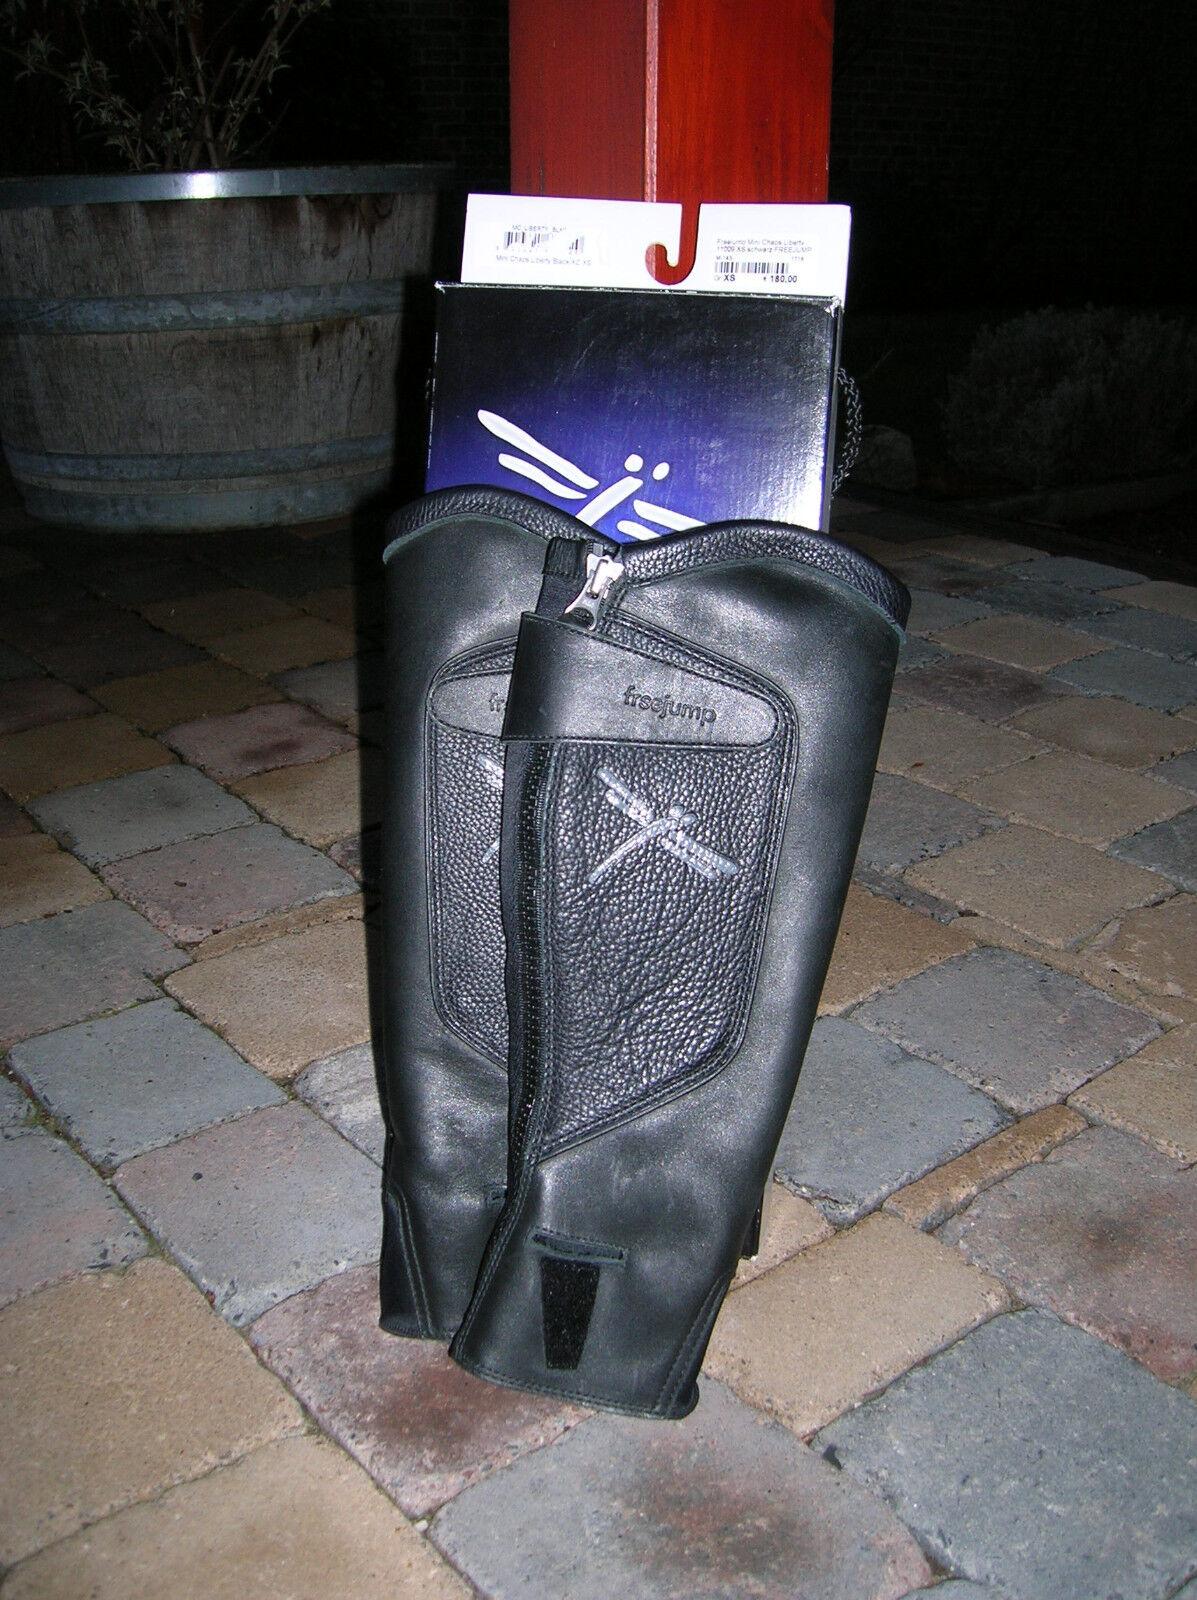 FREEJUMP Minichaps Liberty XC - Gr. XS XS XS - Top-Angebot  - Neuware 67950b